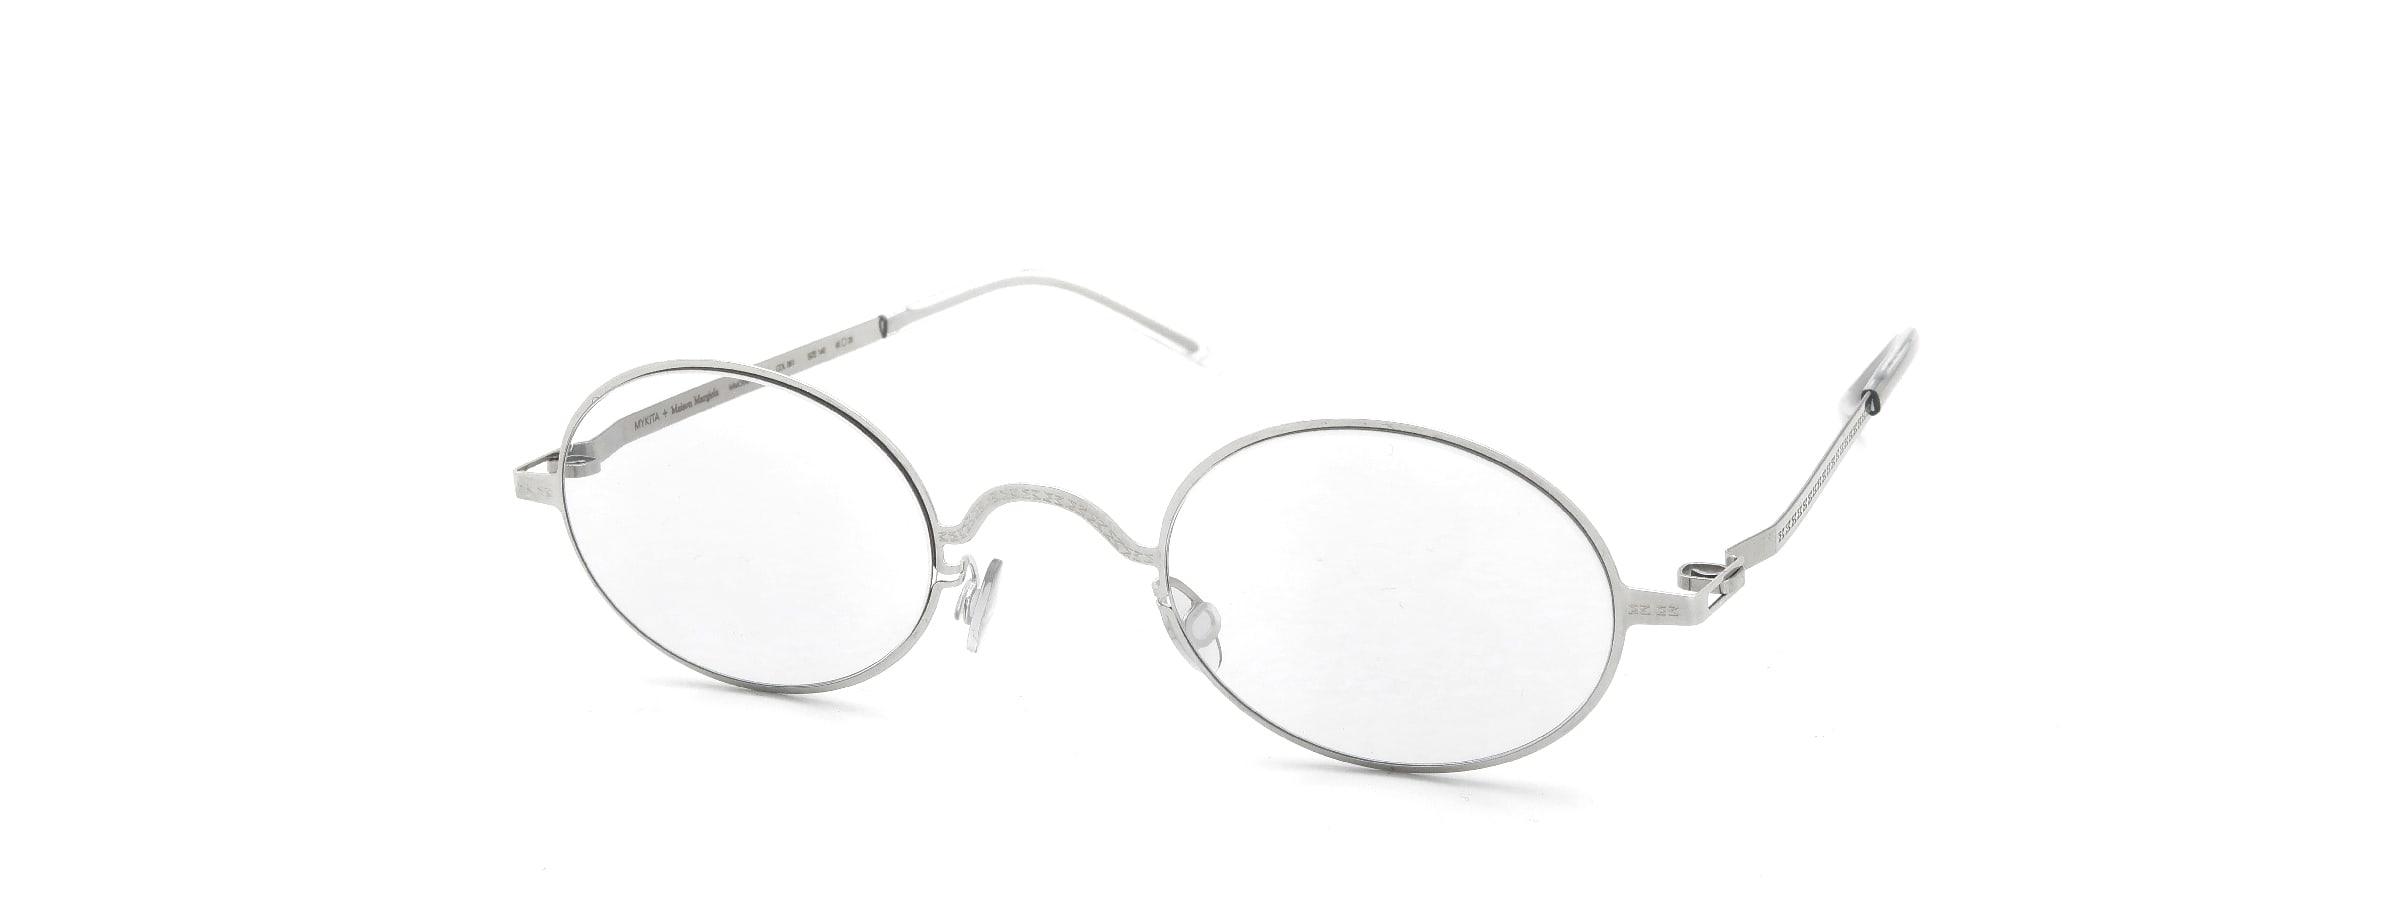 MYKITA + Maison Margiela MMCRAFT005 COL.051 Shiny Silver全体像